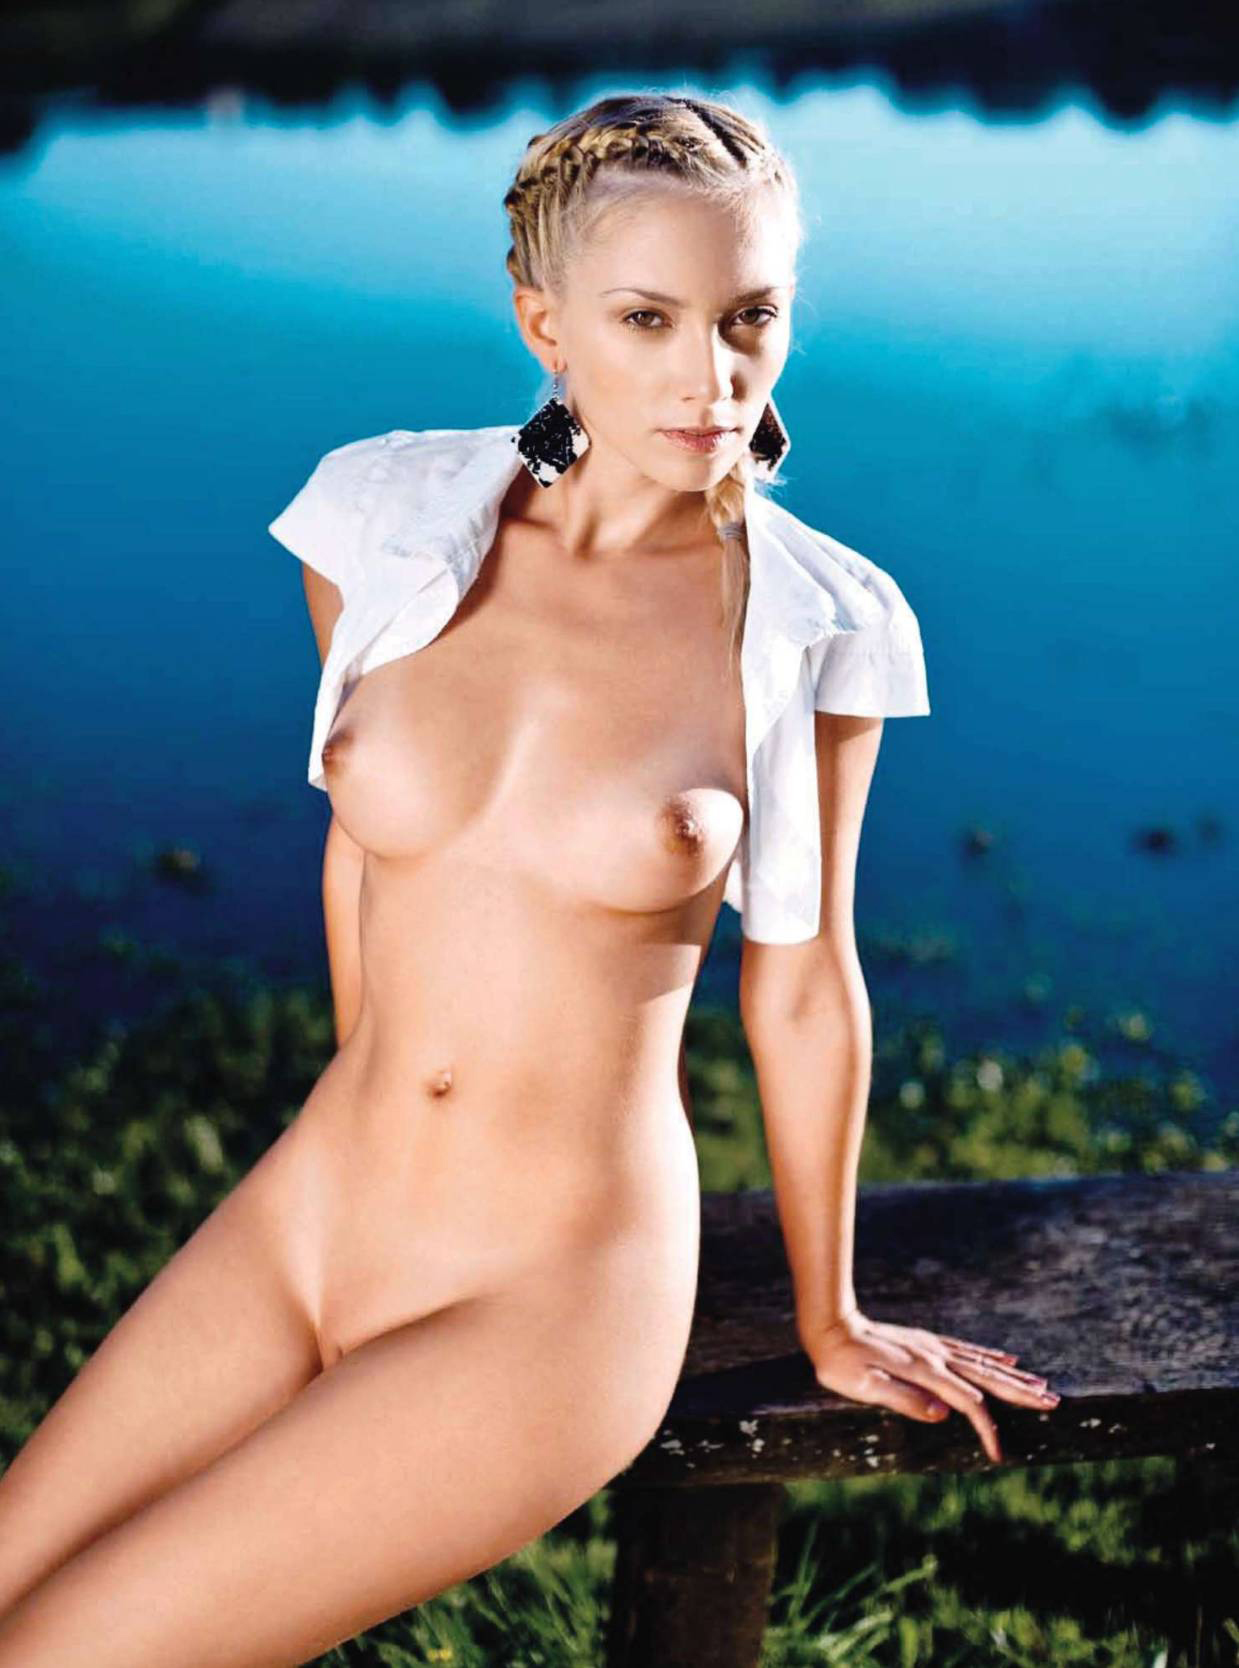 65757_Anamarija_Frlan_Playboy_2010_10_Croatia_11_123_430lo.jpg